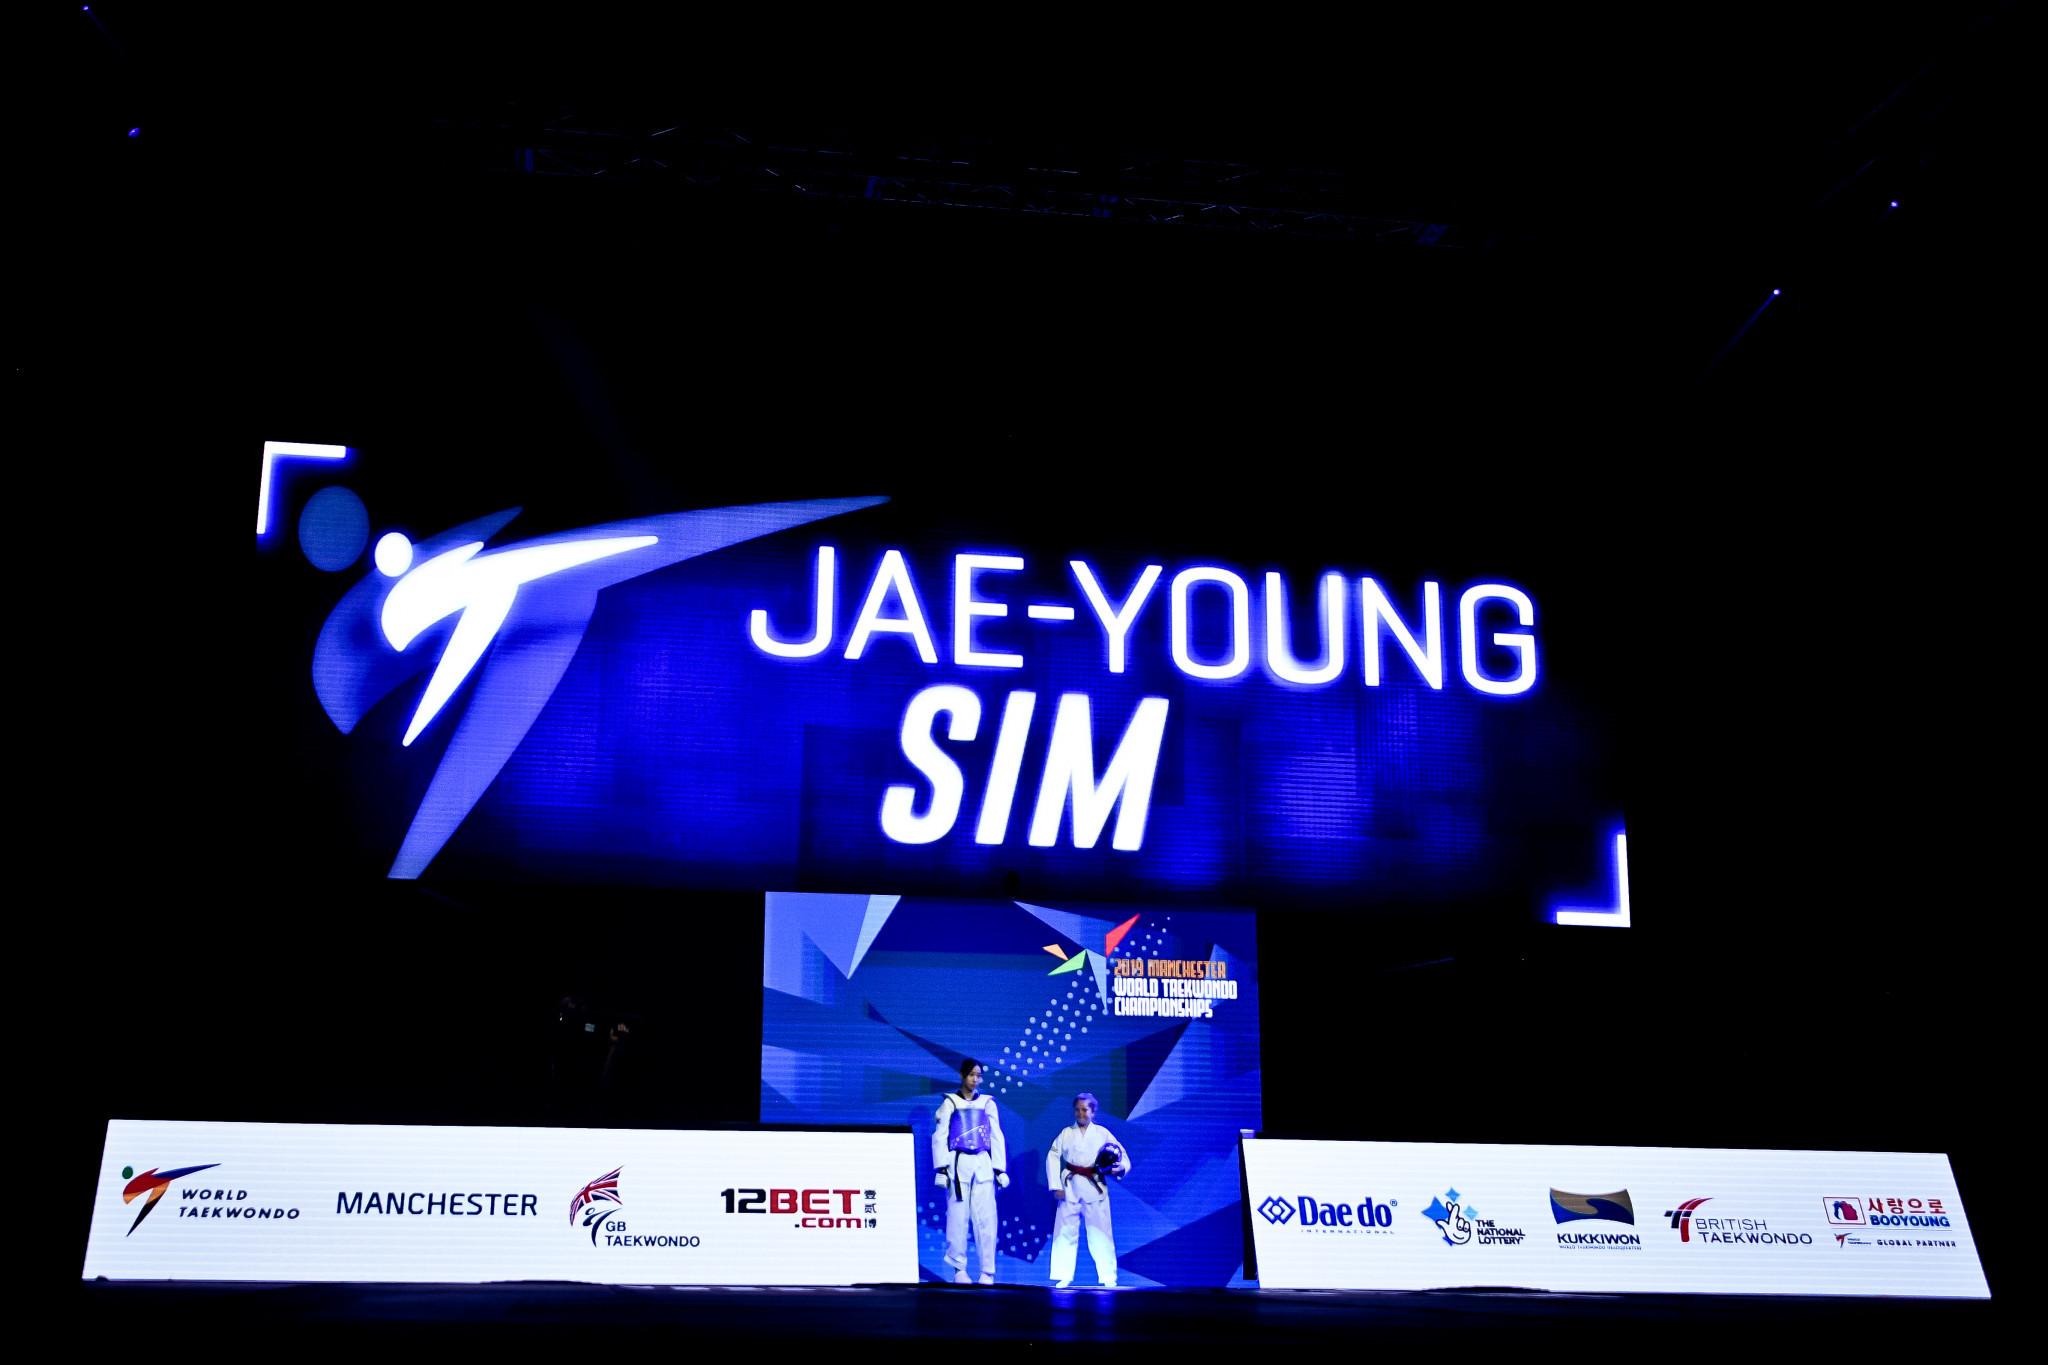 Sim Jae-young won a second successive women's under-46kg world title at the World Taekwondo Championships ©World Taekwondo